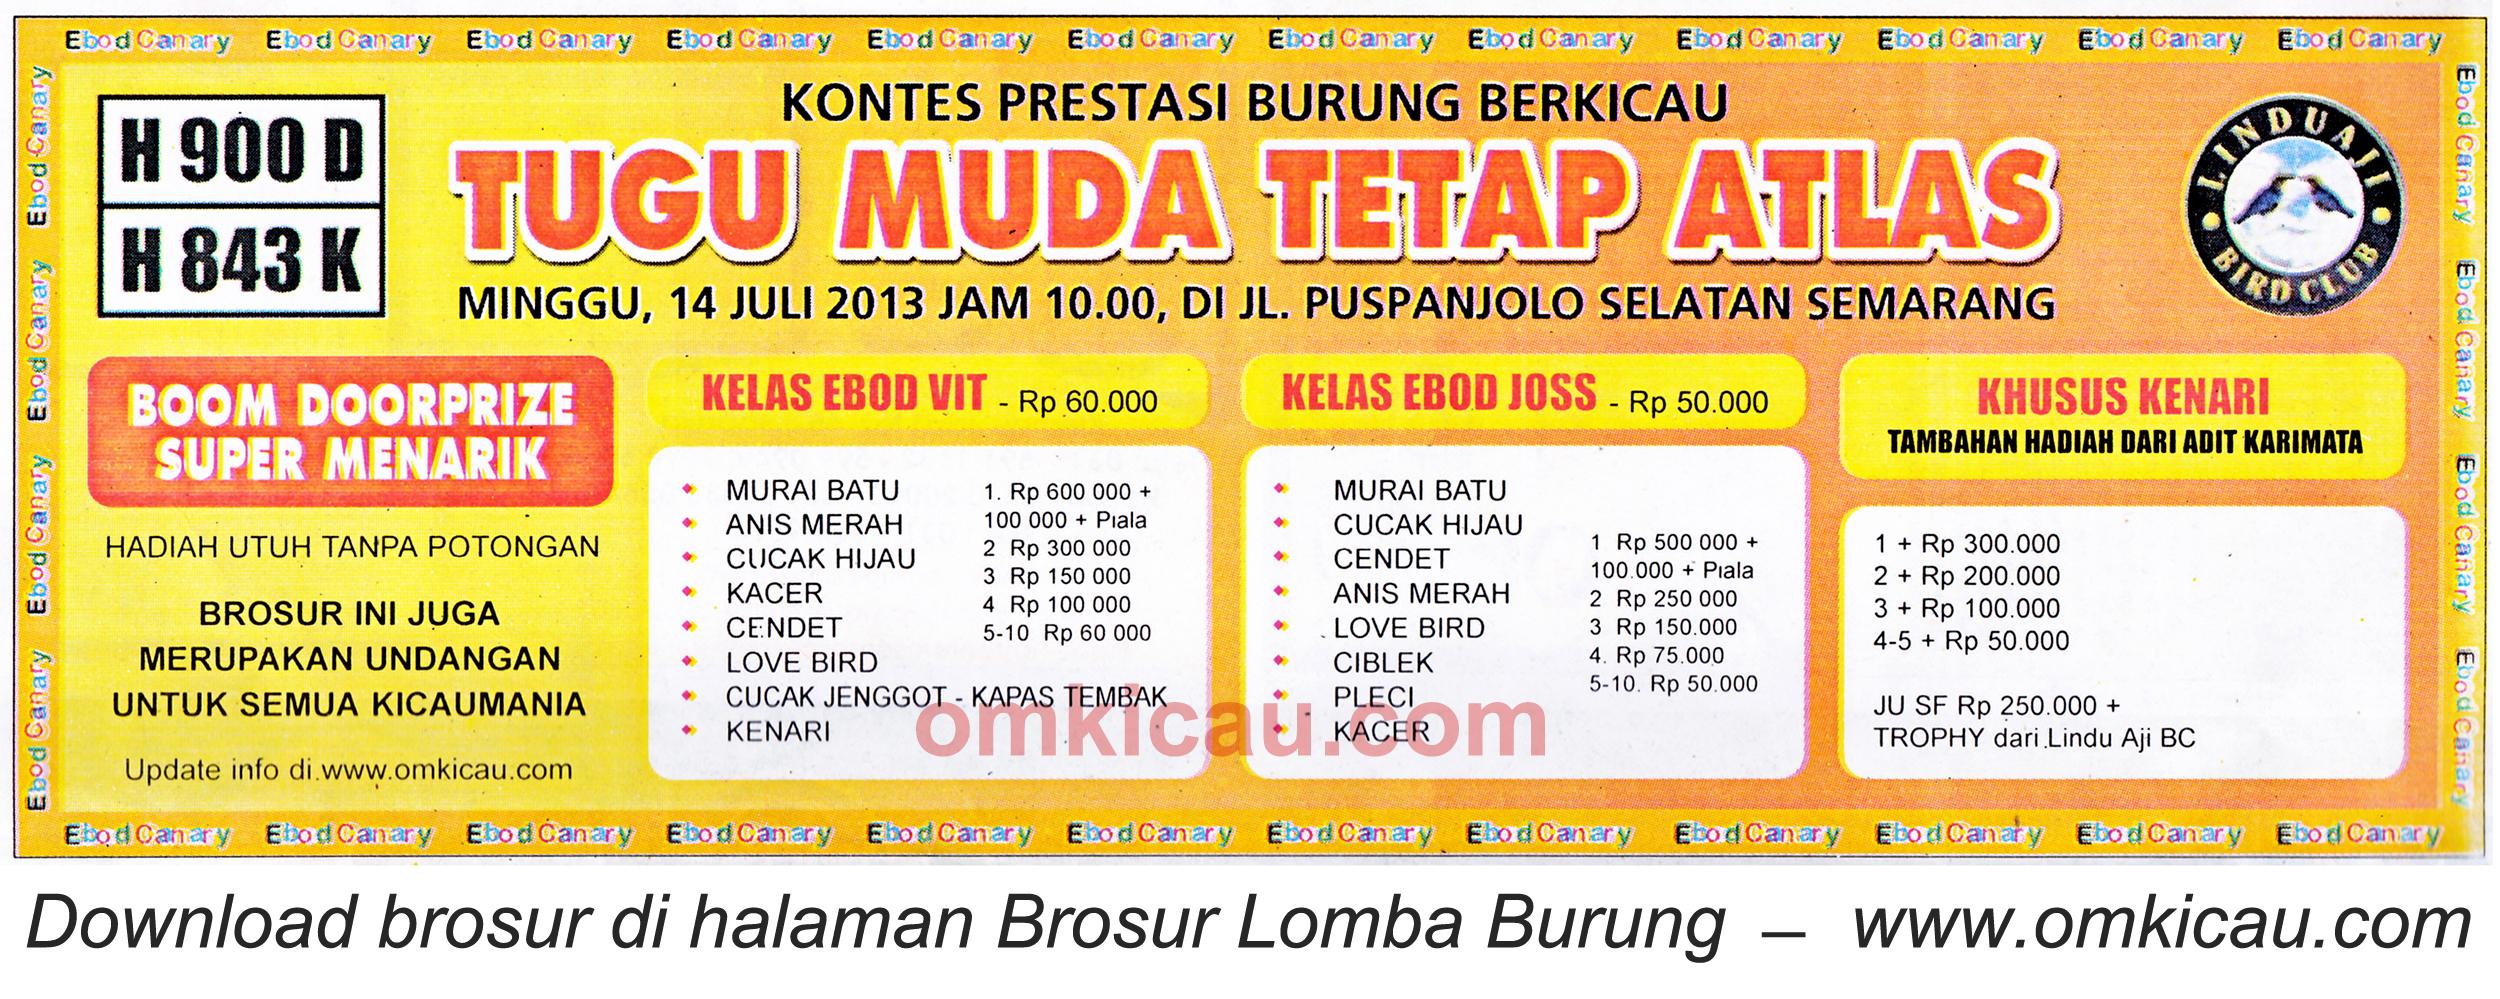 Brosur Lomba Burung Tugu Muda Tetap Atlas - Semarang 14 Juli 2013